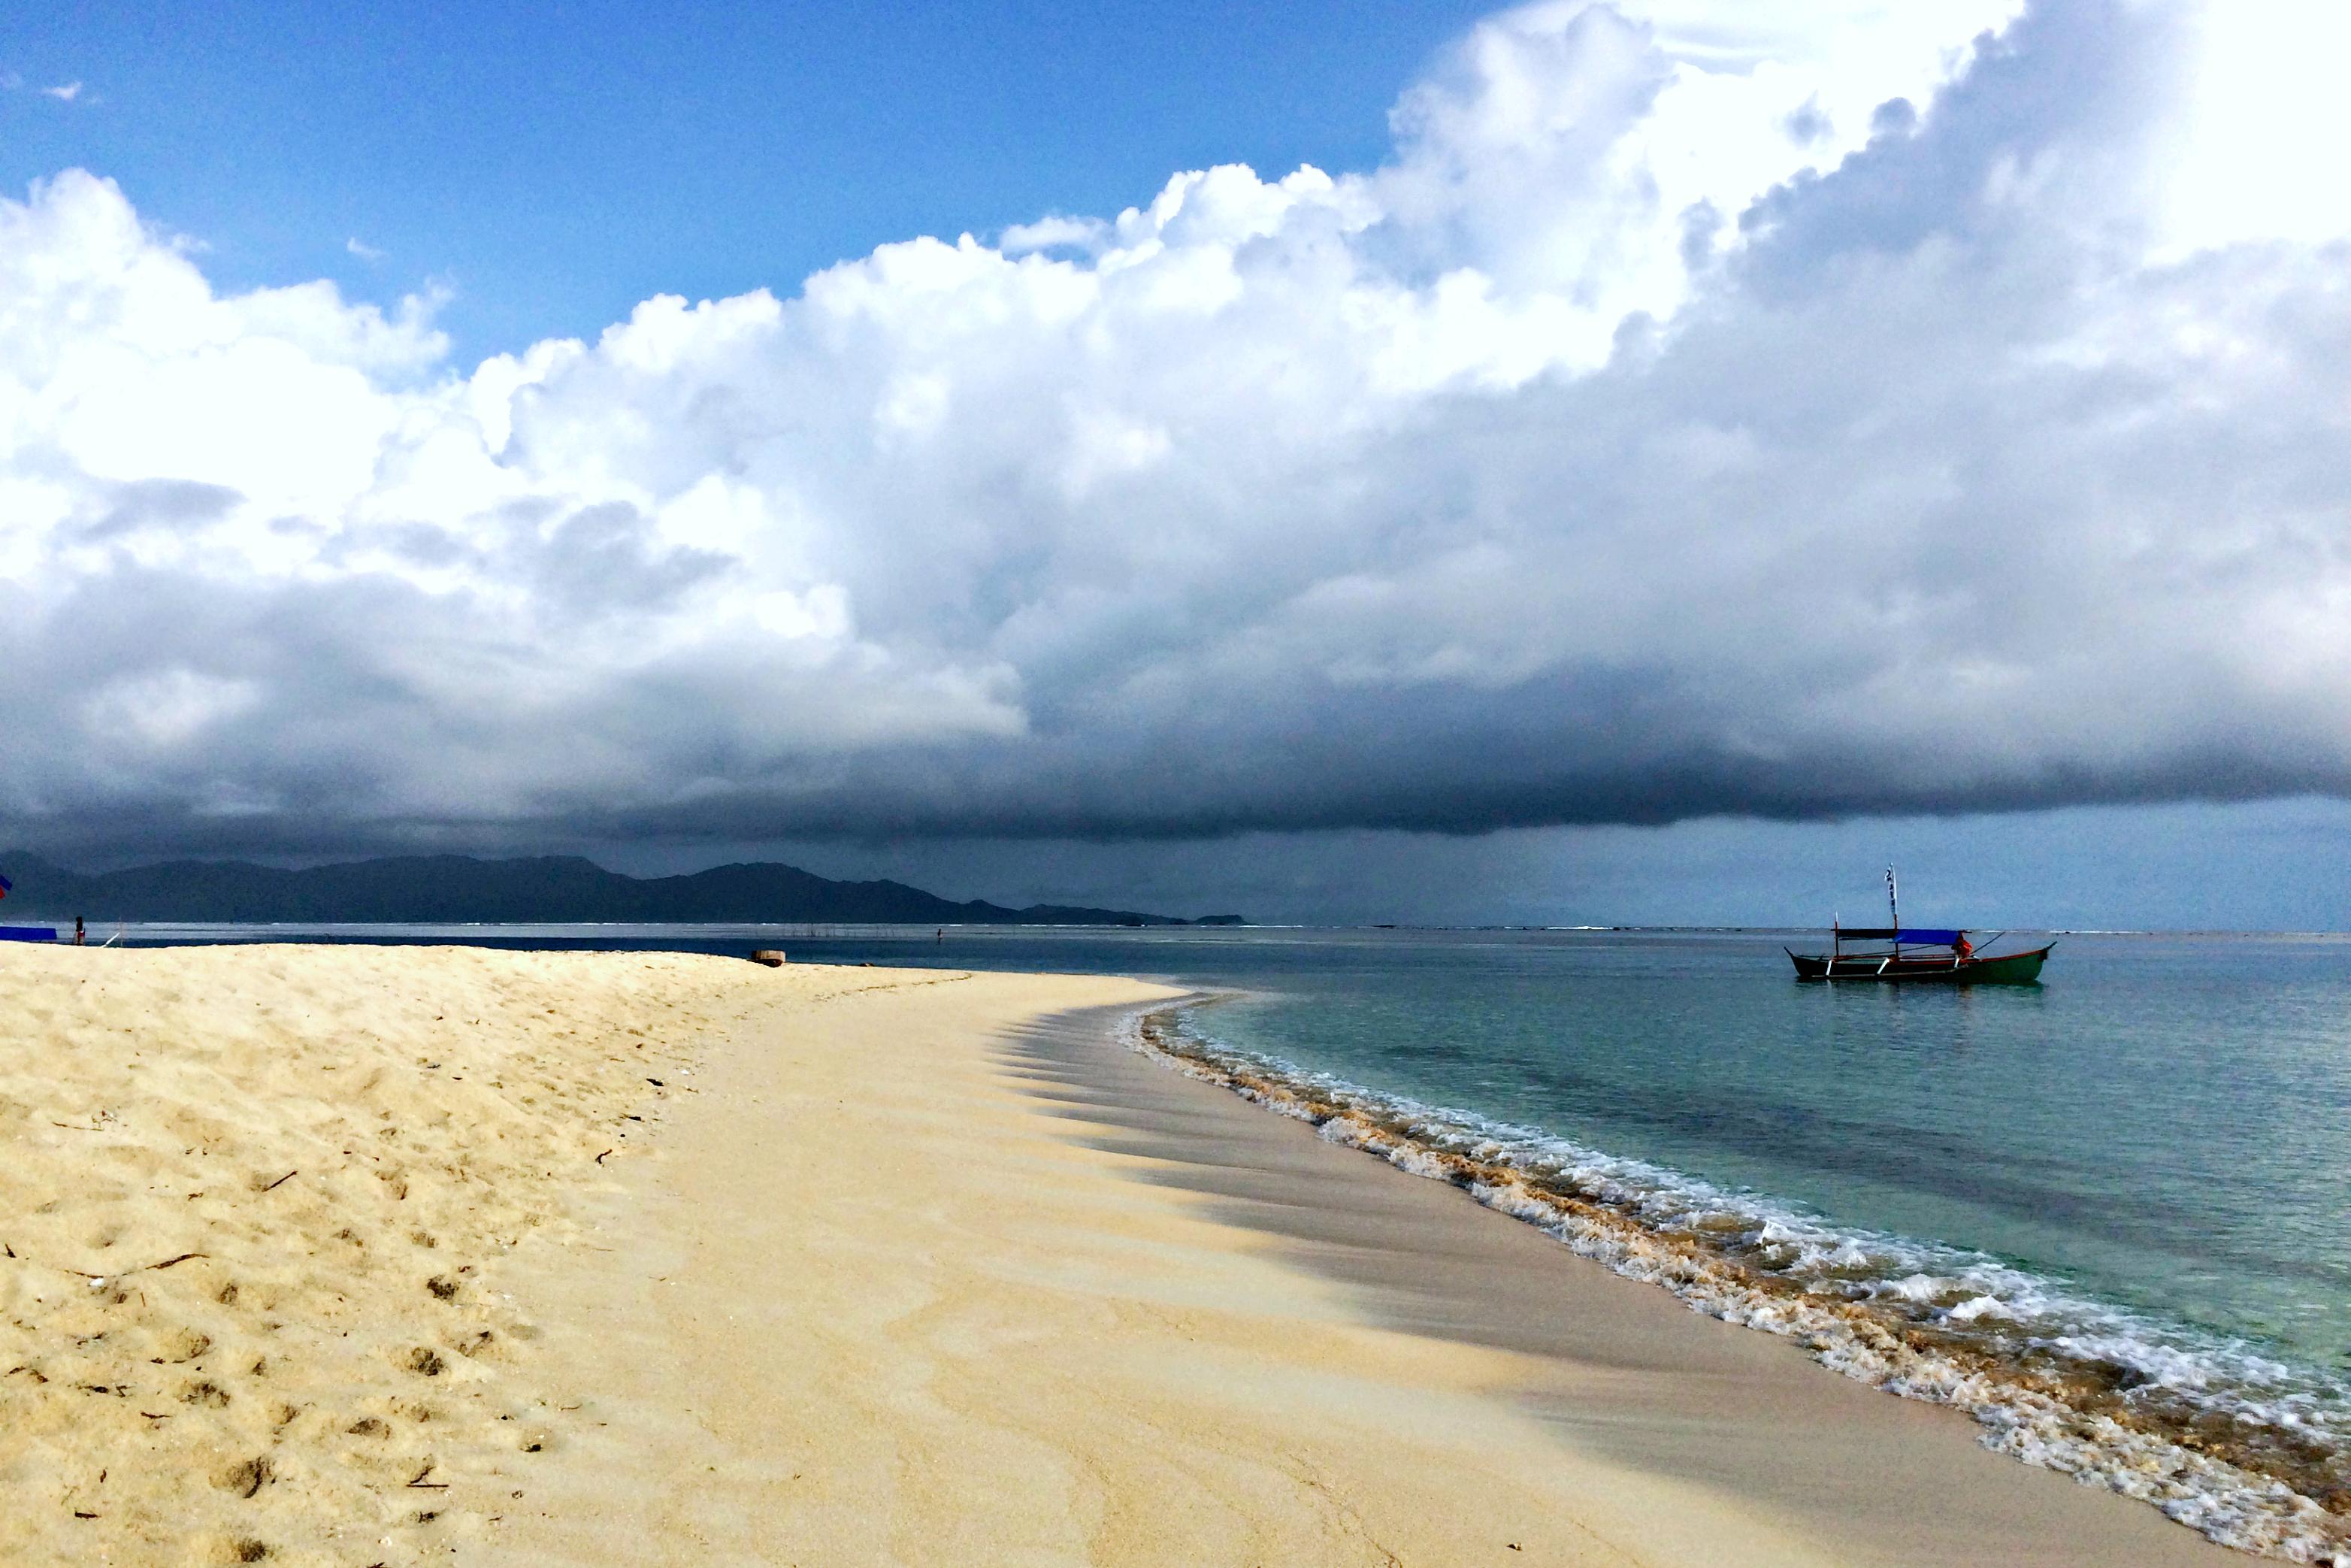 Anguib Beach, Cagayan Valley, PH - 2015